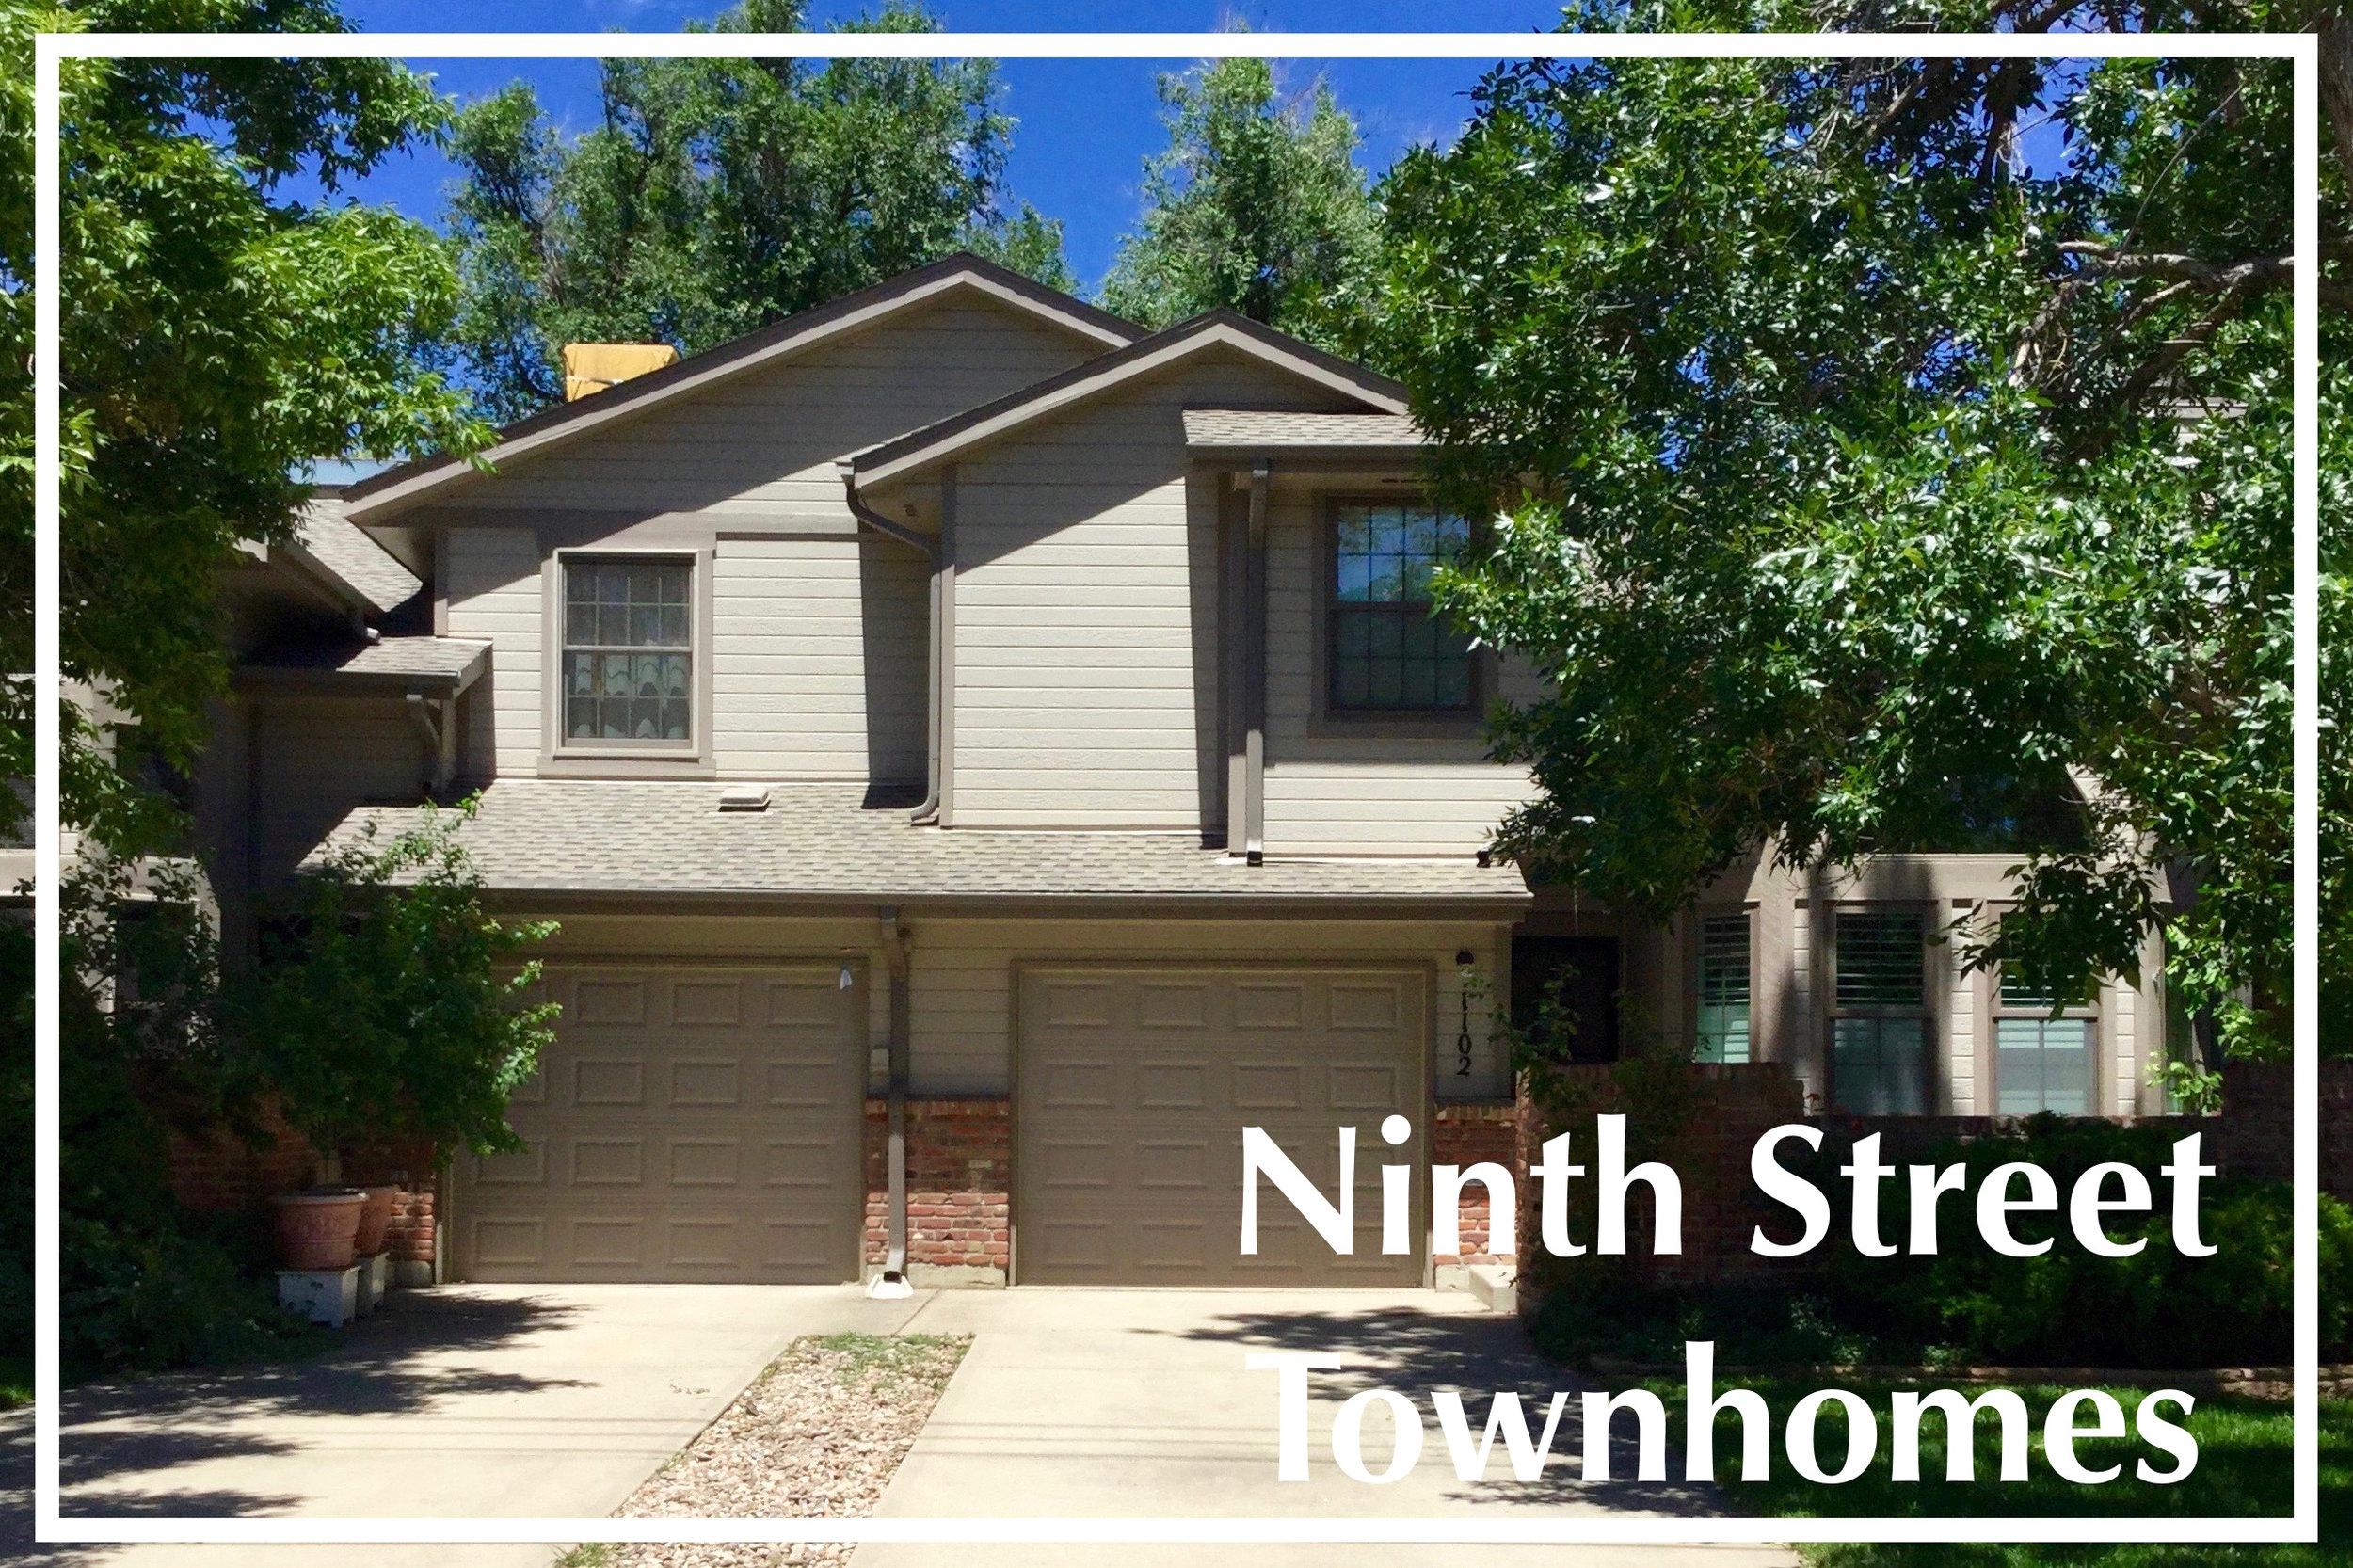 Ninth Street Townhomes.jpg